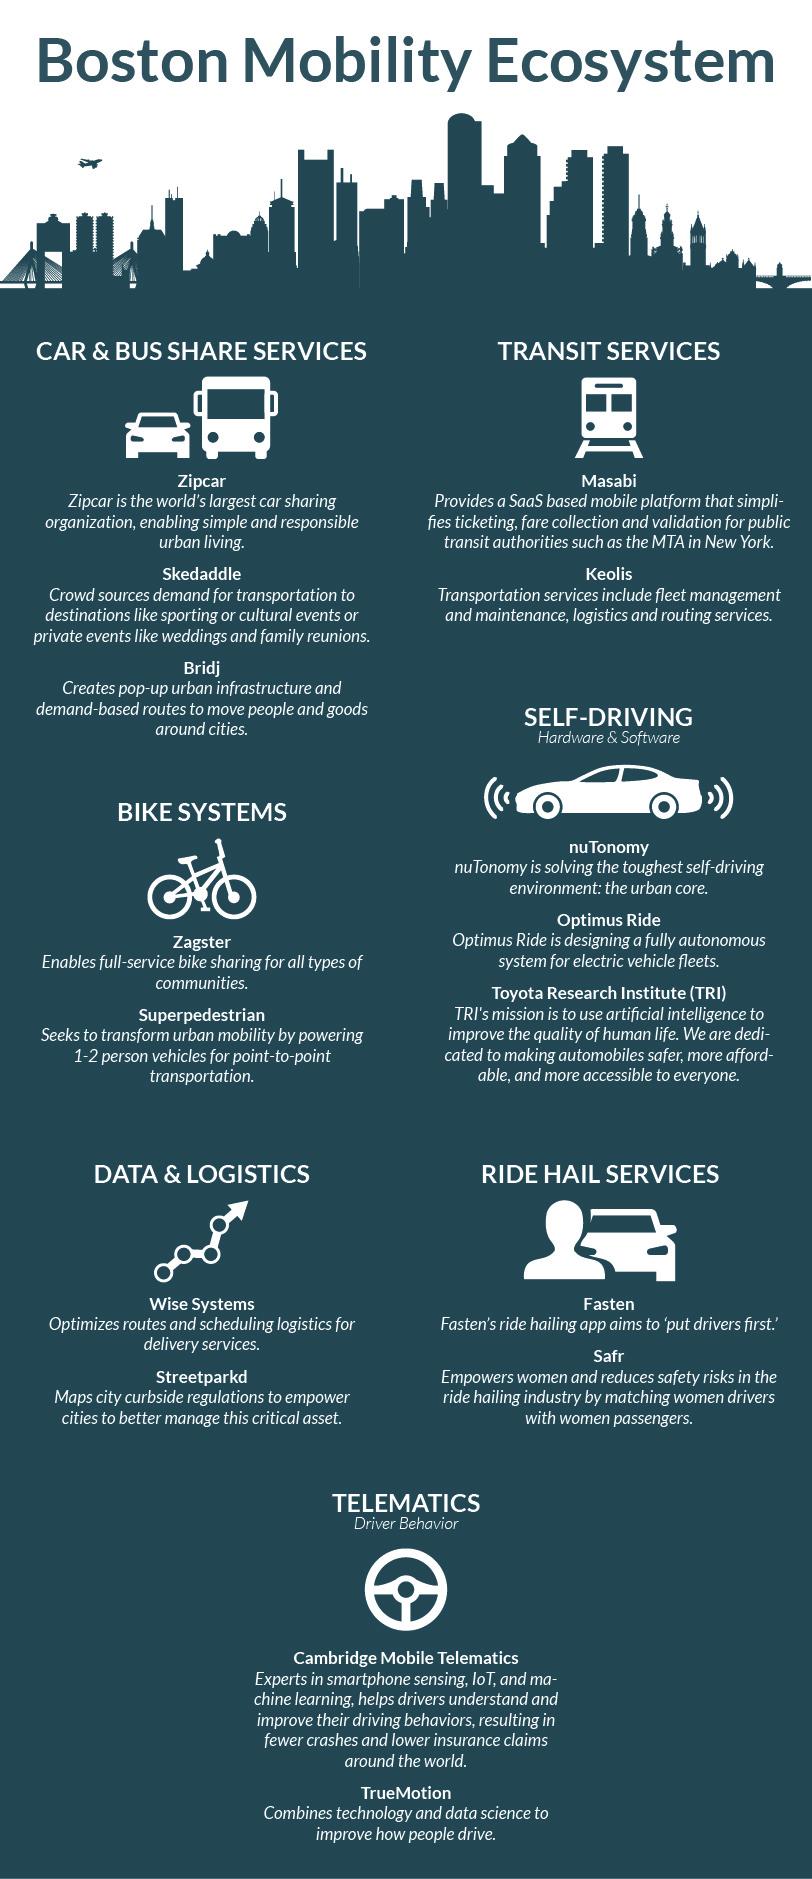 Boston Mobility Ecosystem